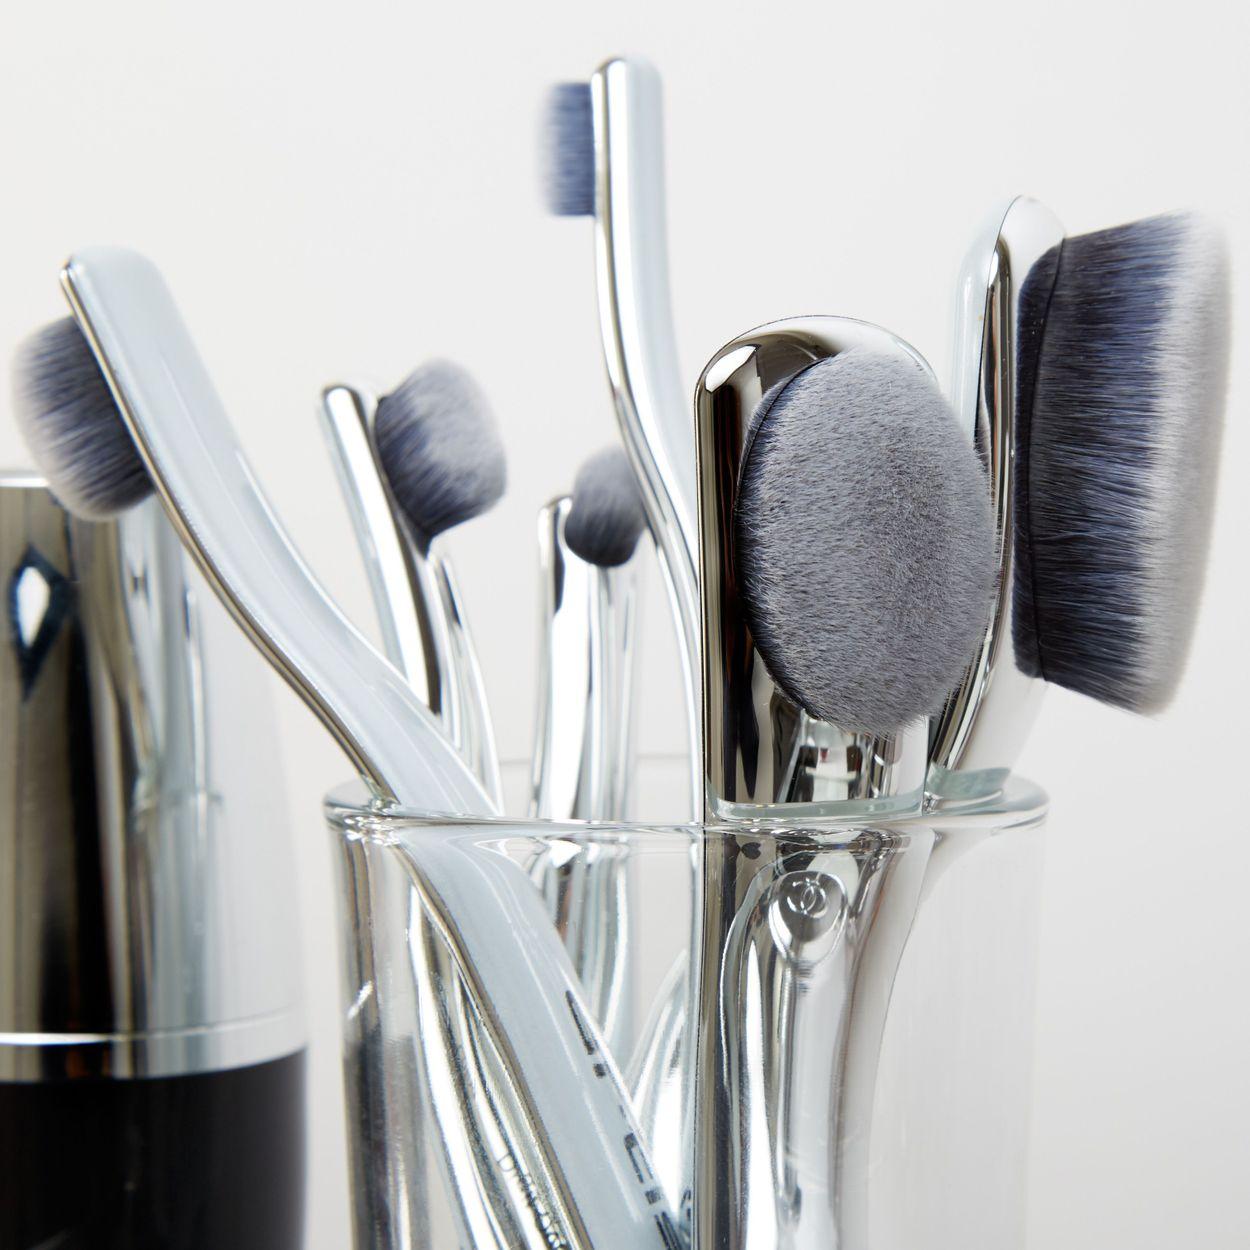 Digit brushes in cup on vanity